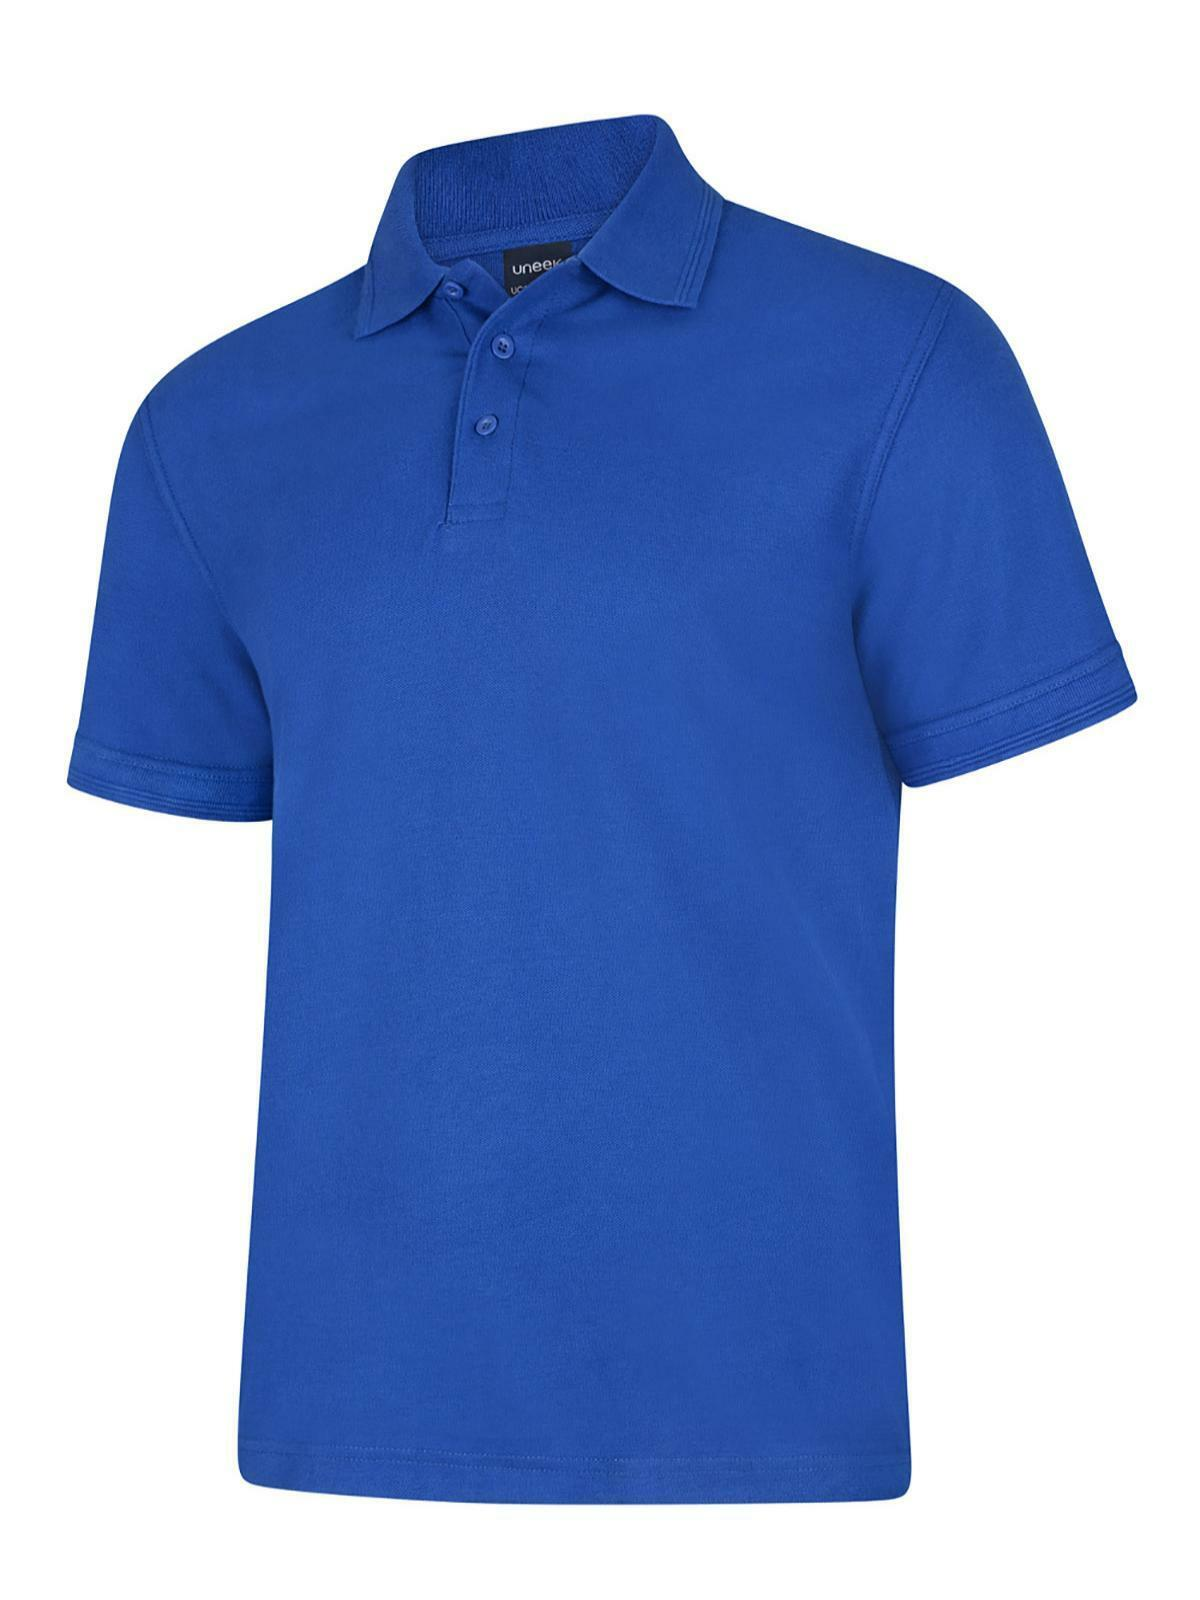 Uneek Deluxe Polo Shirt Men/'s Casual Smart Top Work Office Clothing Wear UC108